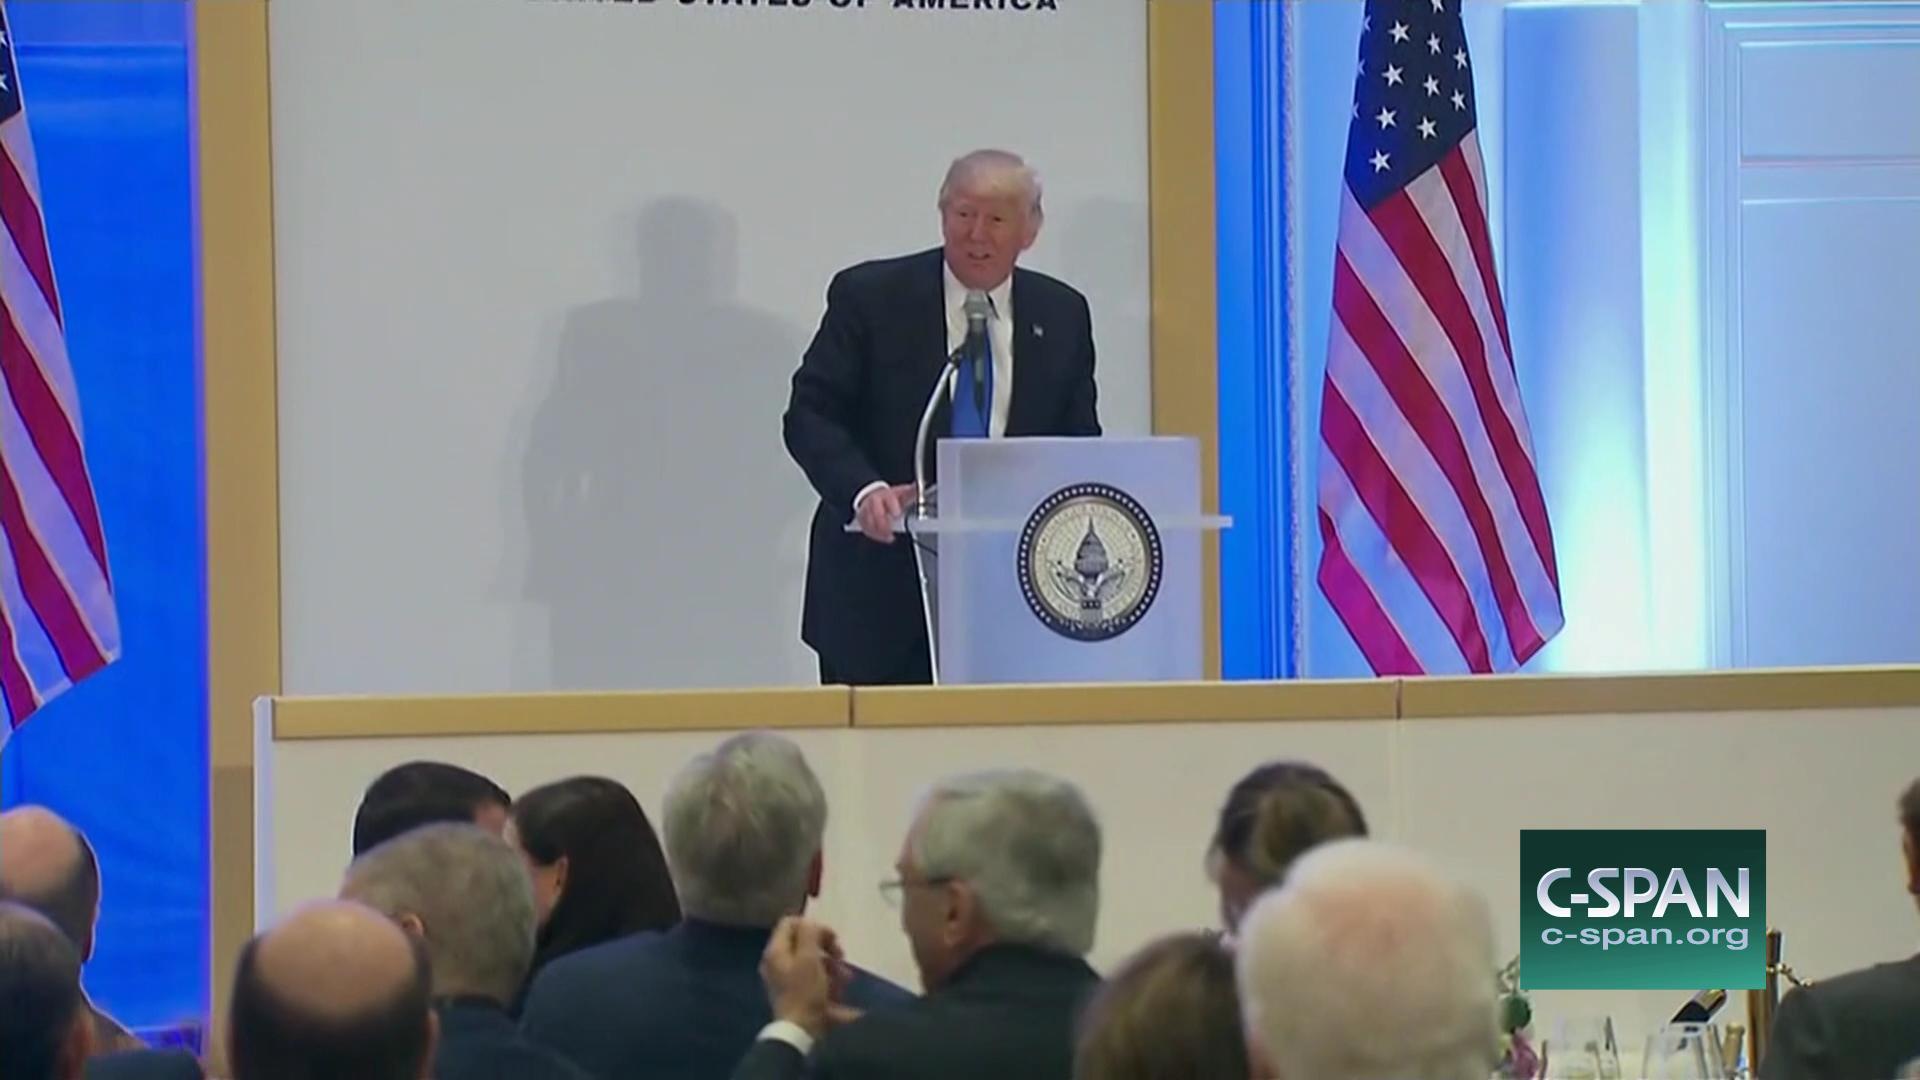 Presidentelect Donald Trump Luncheon At Trump International Hotel